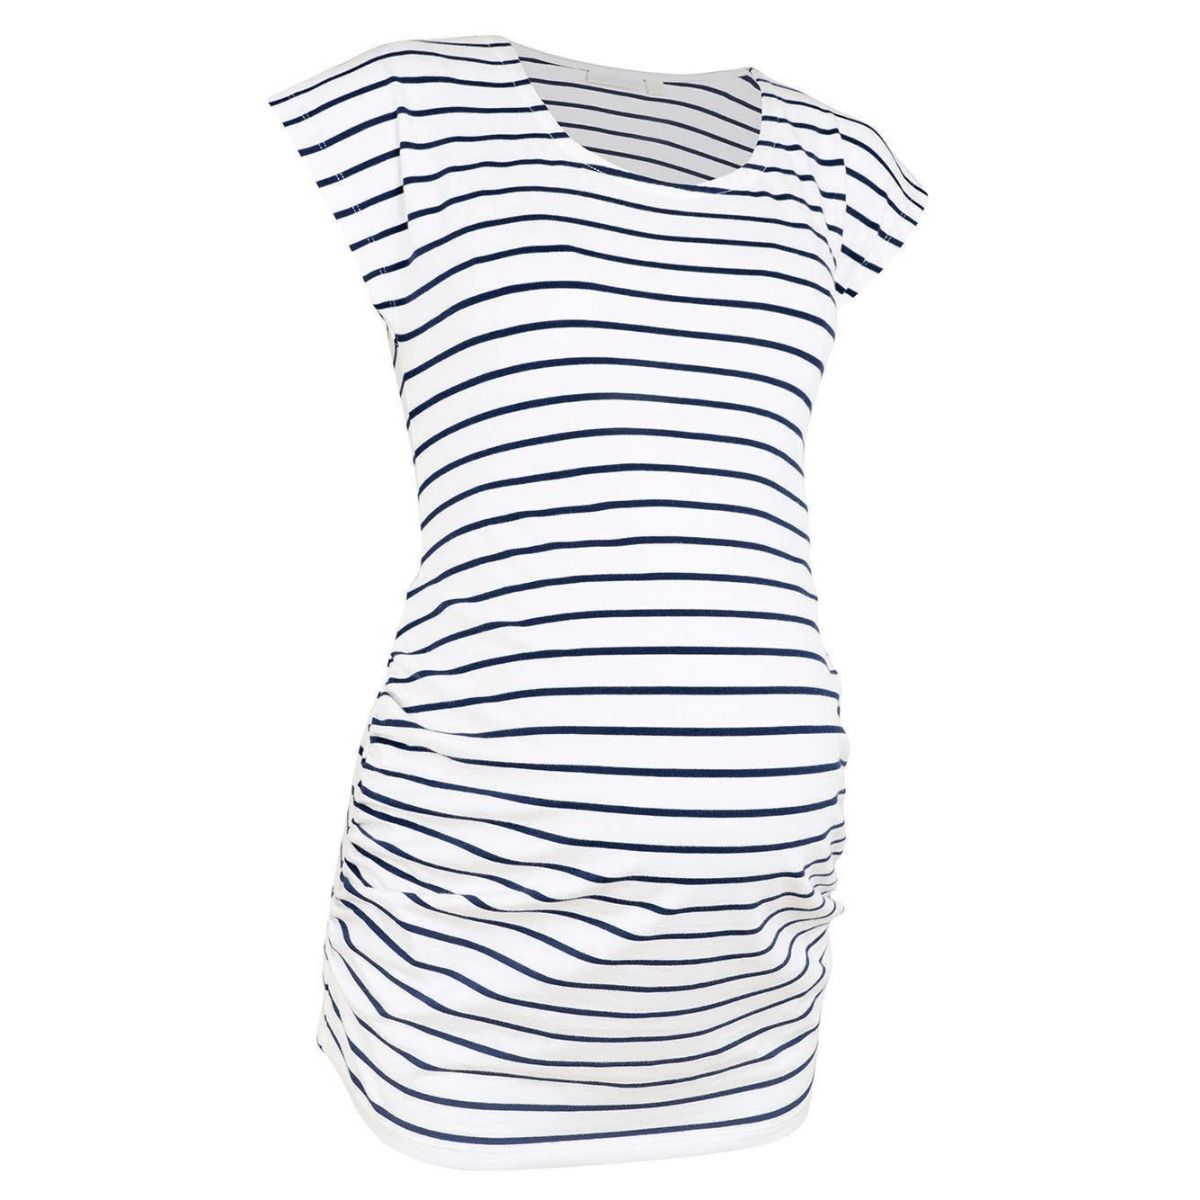 53b95d8c1 Camiseta Premamá Fruncida con Rayas Breton - ShopMami